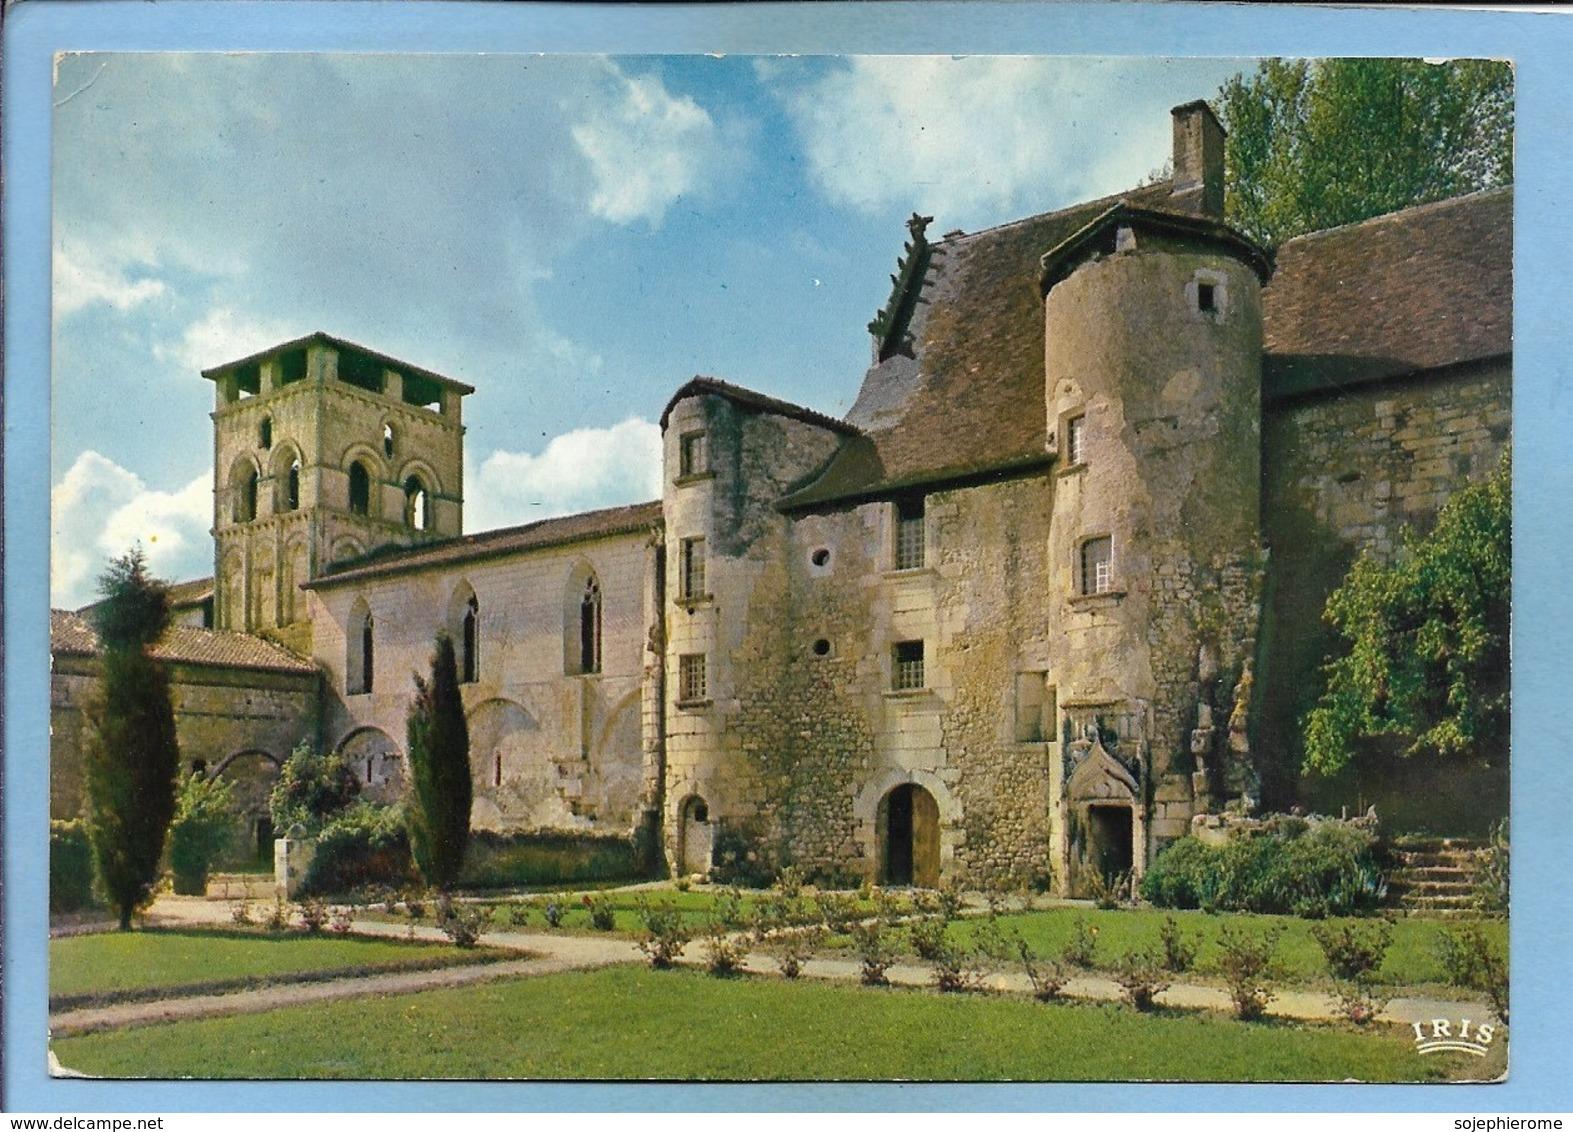 Chancelade (24) L'abbaye (Notre-Dame) De Chancelade Ancien Monastère Fondé En 1128 église 12e S. 2 Scans - France